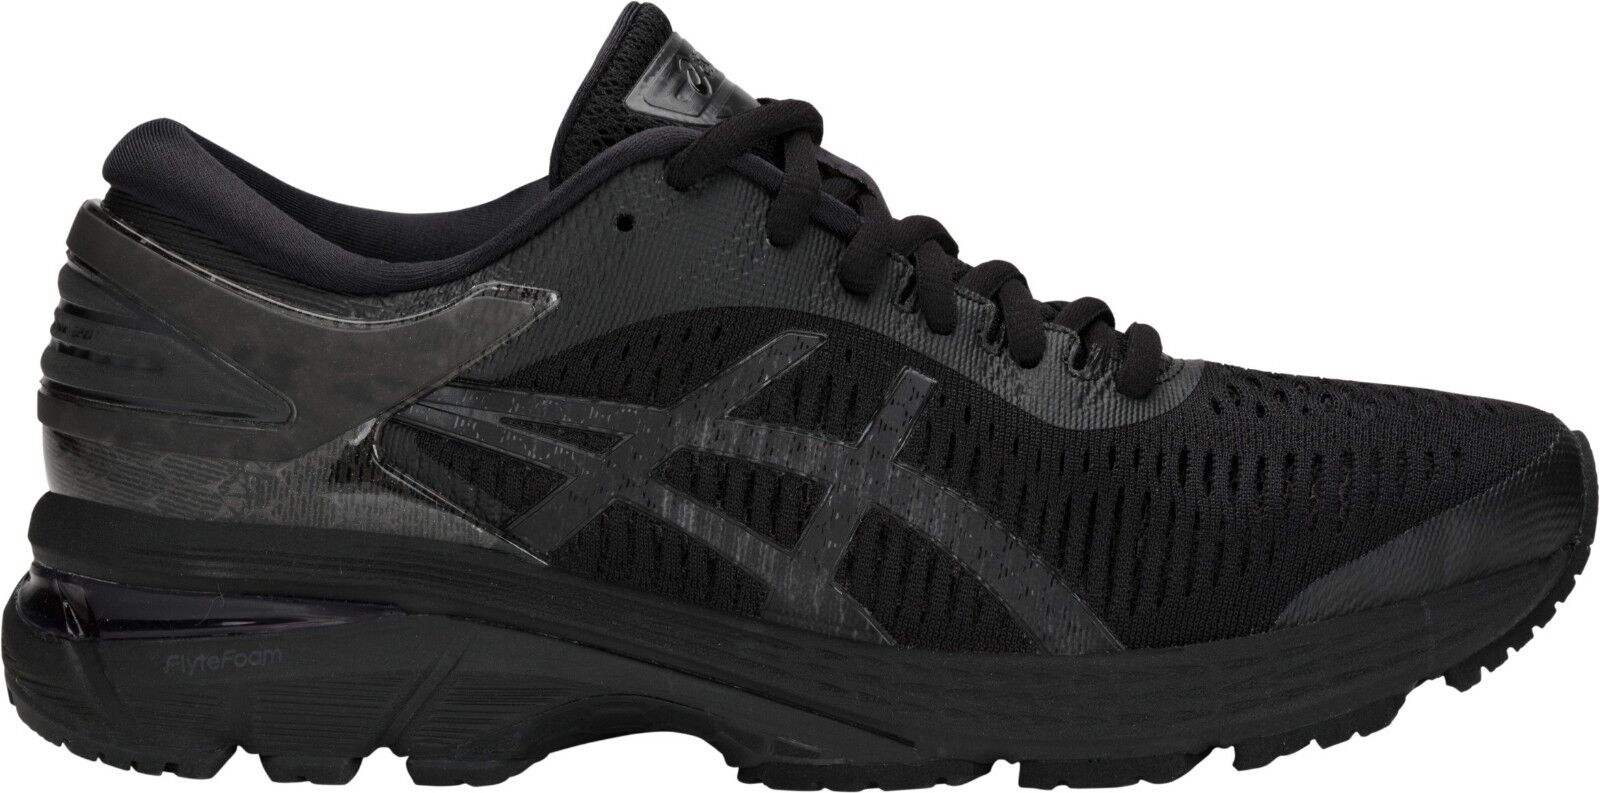 BARGAIN    Asics Gel Kayano 25 Womens Running shoes (B) (002)